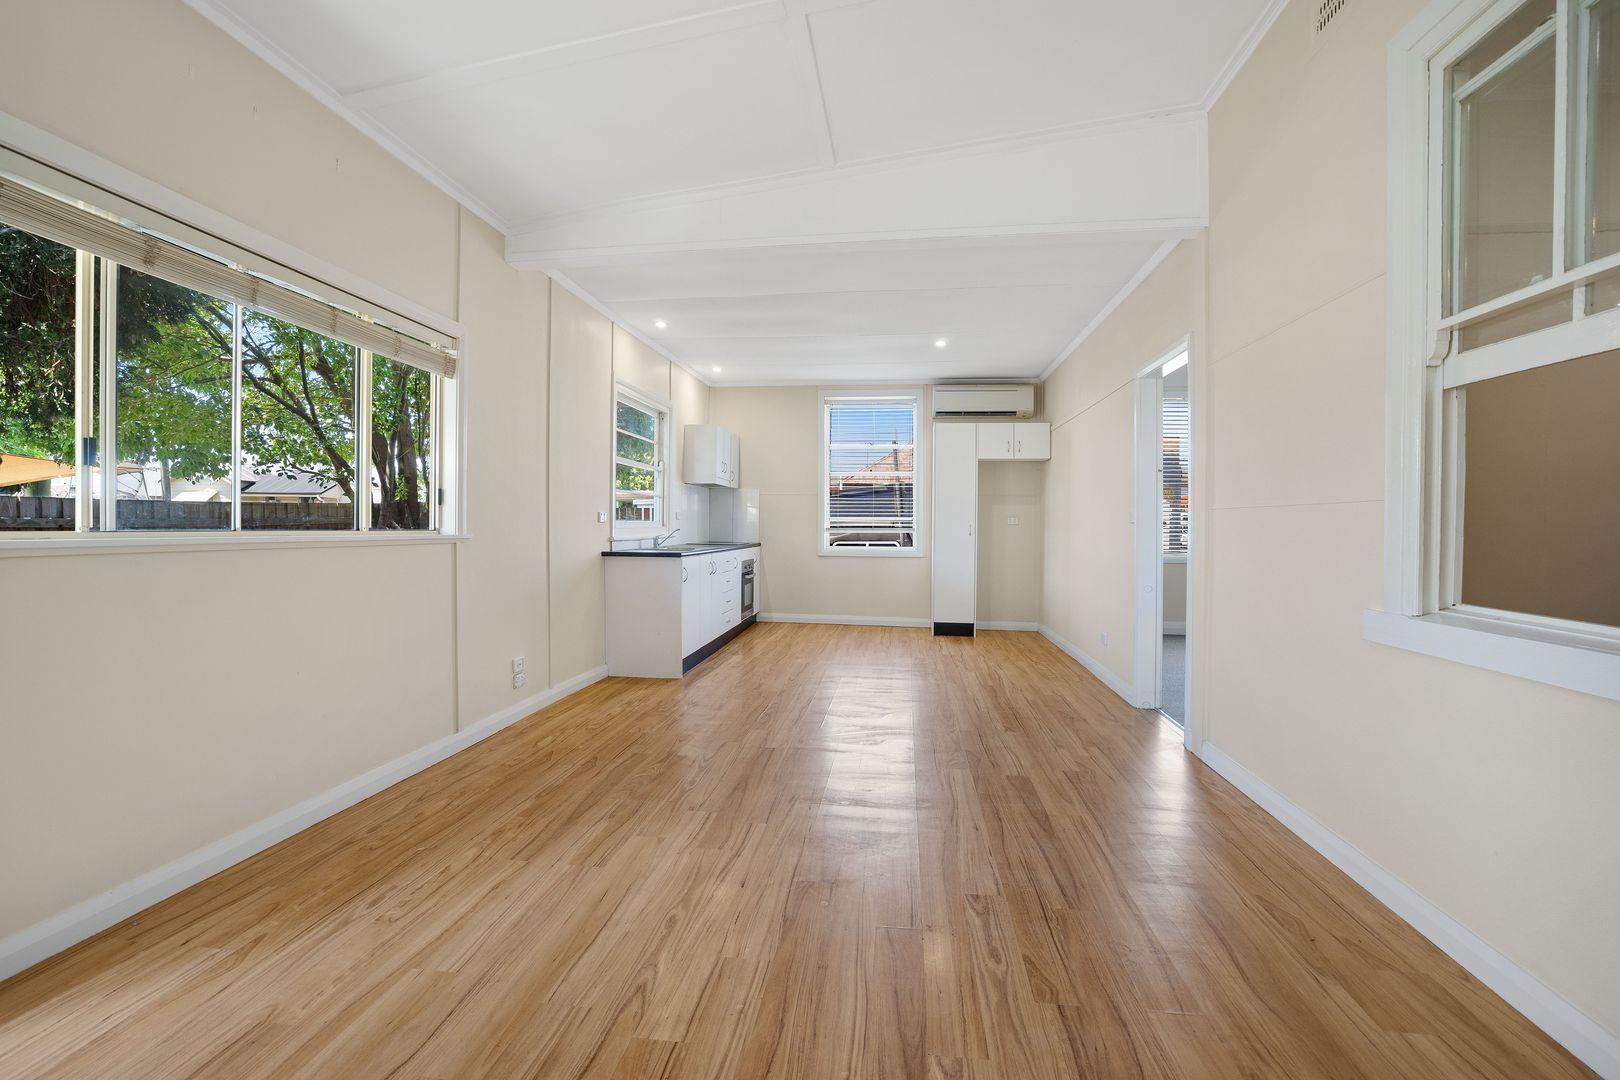 37-39 Broadmeadow Road, Broadmeadow NSW 2292, Image 1